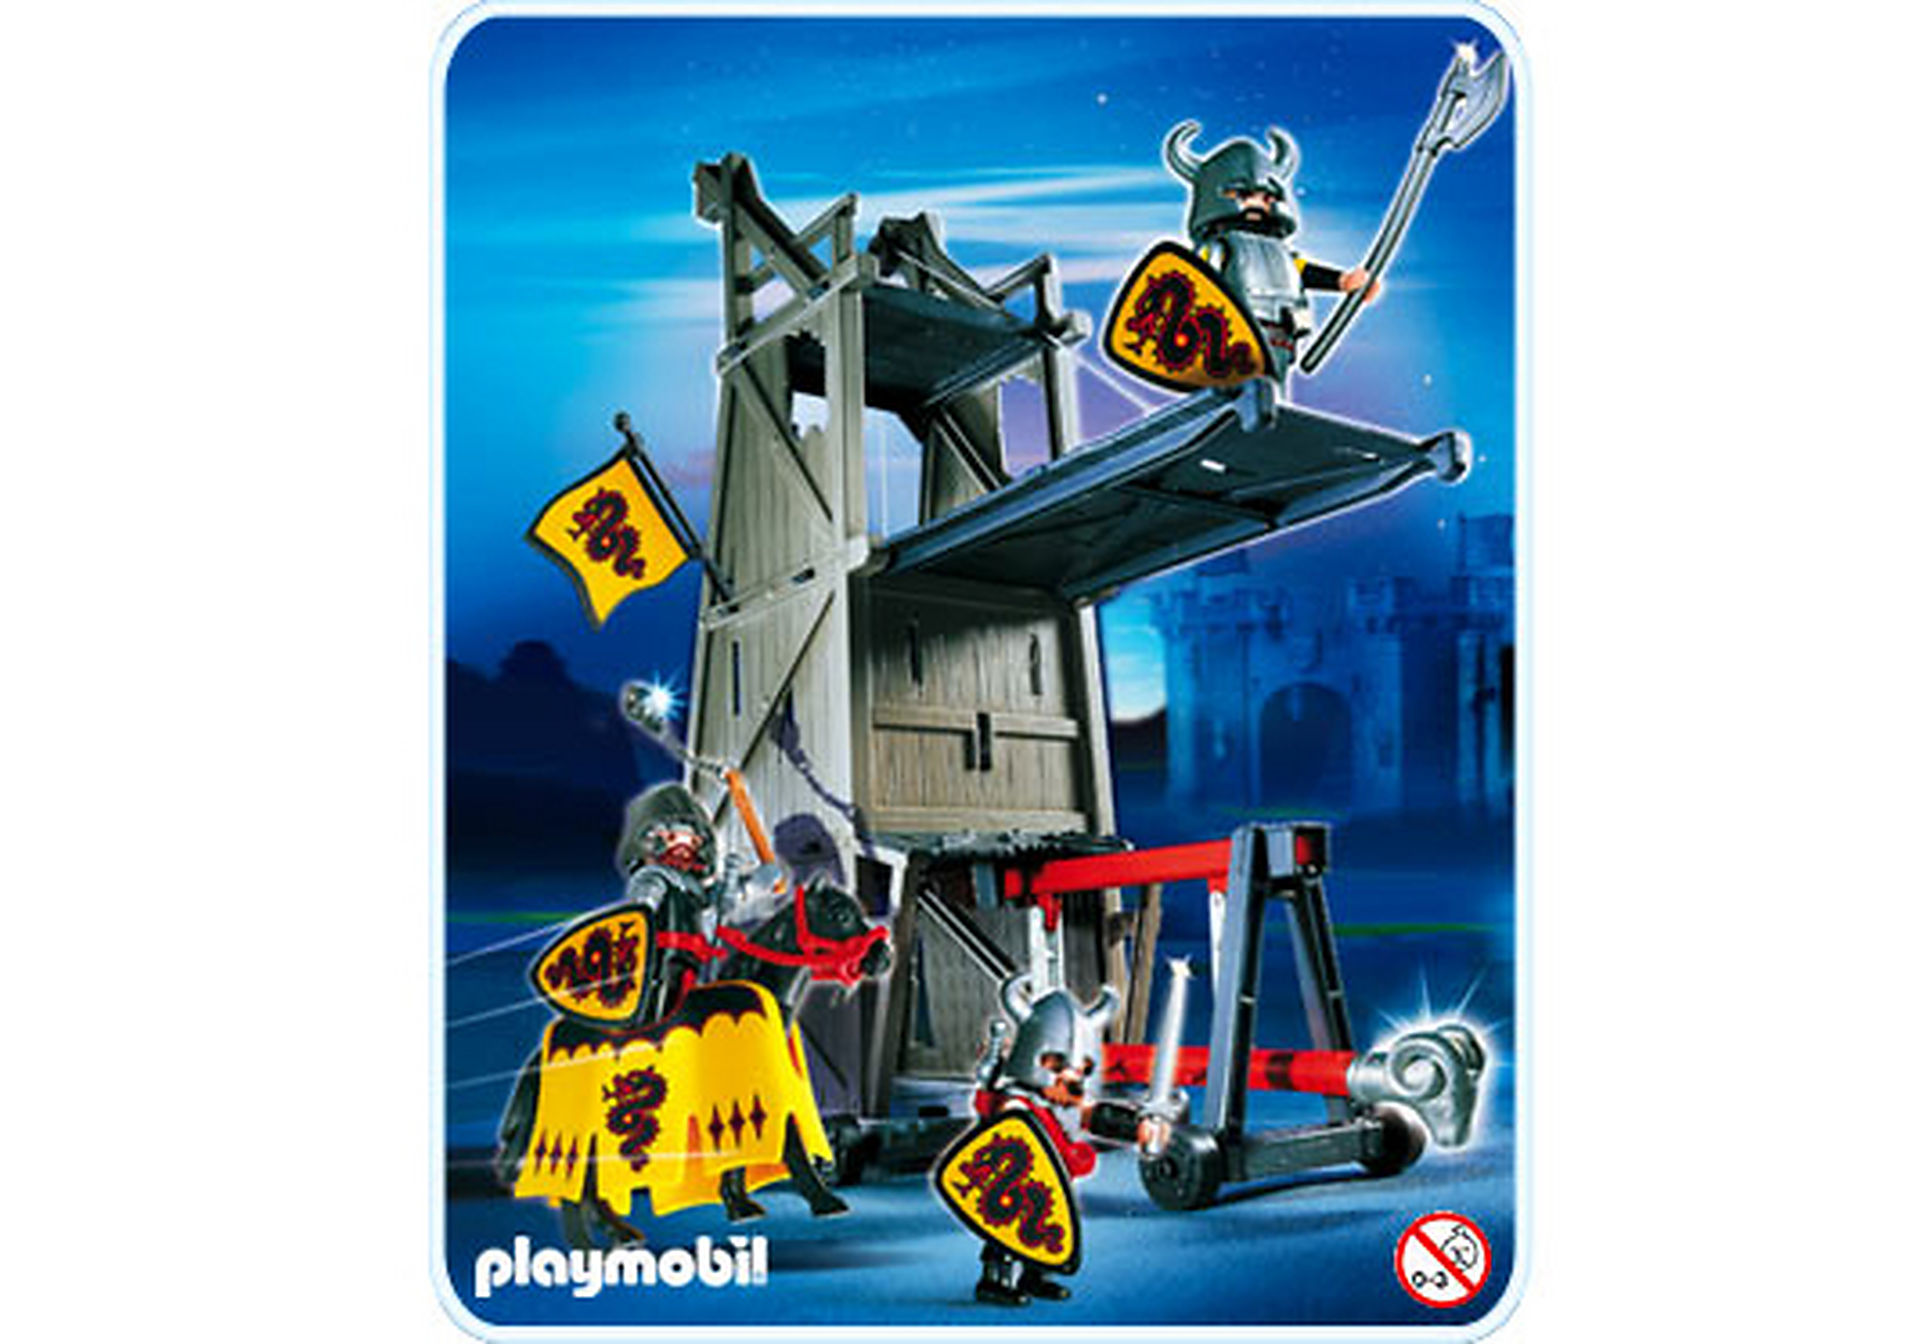 http://media.playmobil.com/i/playmobil/4441-A_product_detail/Attackenturm der Drachenschlange